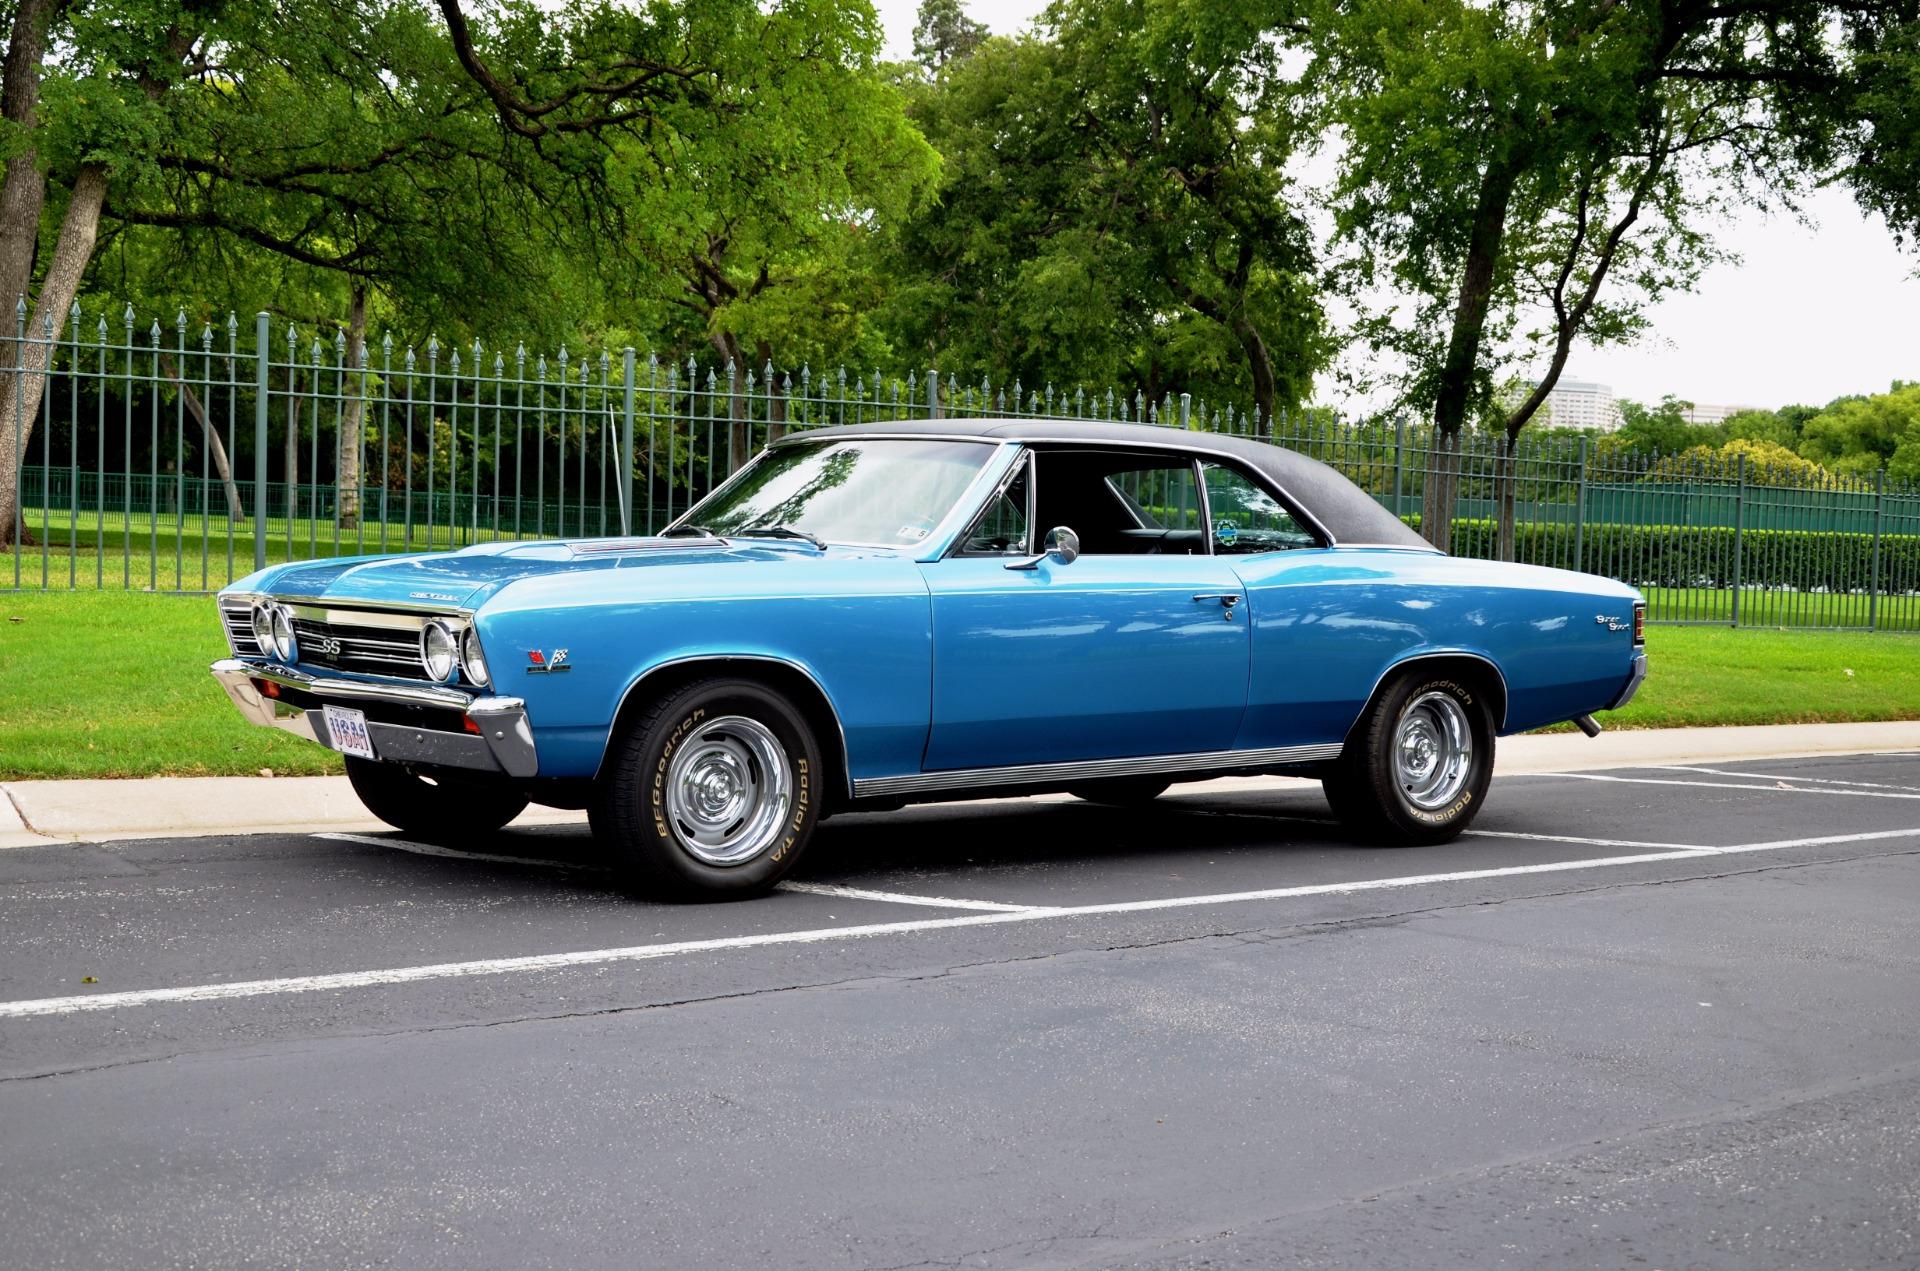 1967 CHEVROLET CHEVELLE for sale Sold Platinum Motorcars in Dallas TX 1